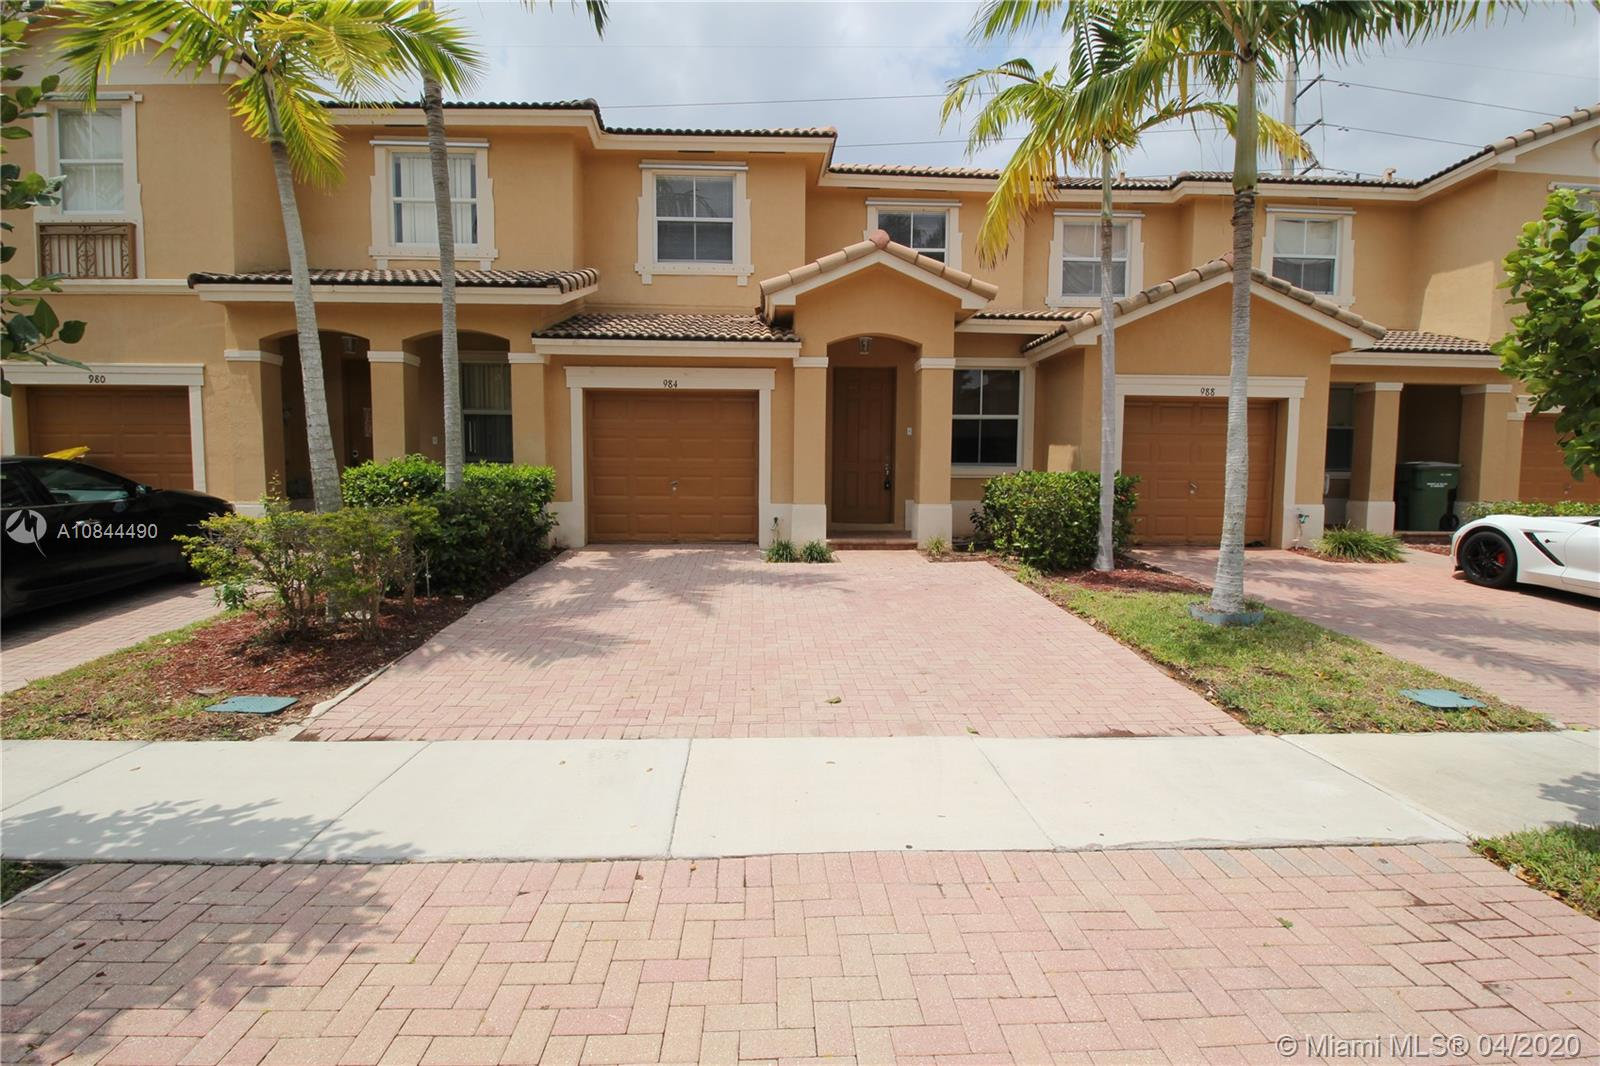 984 NE 41st Pl #984, Homestead, FL 33033 - Homestead, FL real estate listing